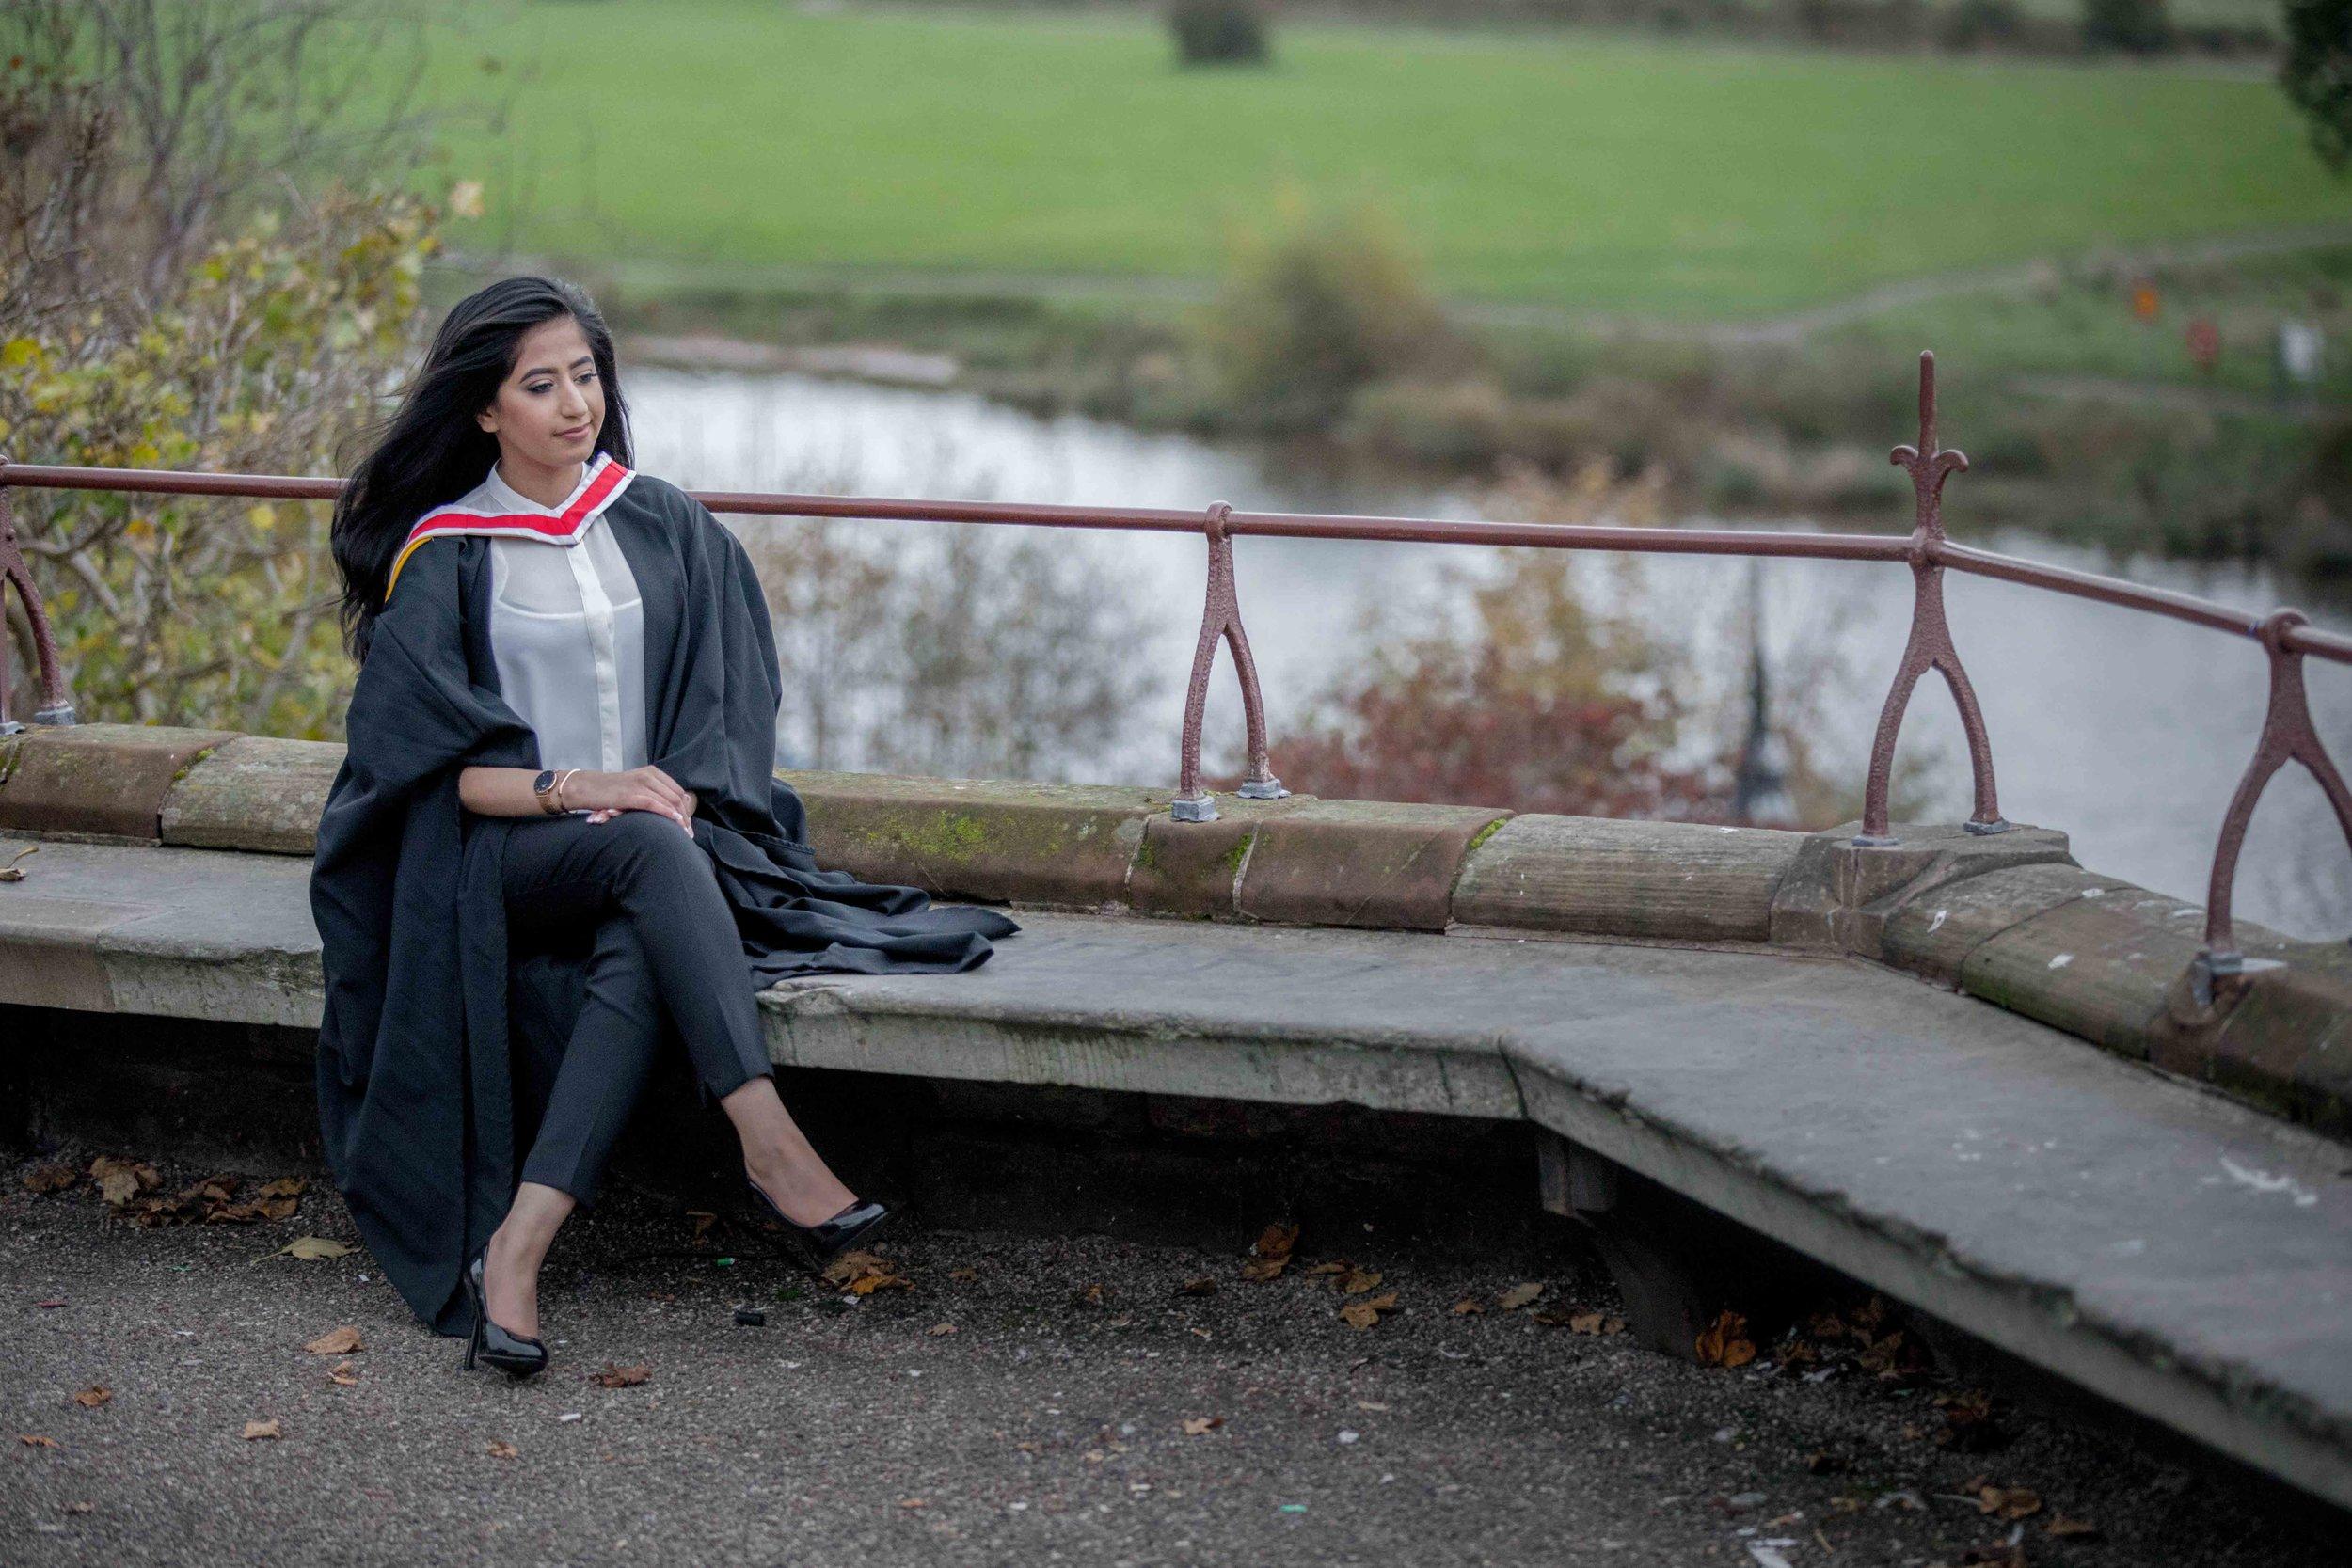 chester-university-graduation-ceremony-photography-photoshoot-graduation-photographer-Bristol-London-Cardiff-Birmingham-Chester-Natalia-smith-photography-17.jpg